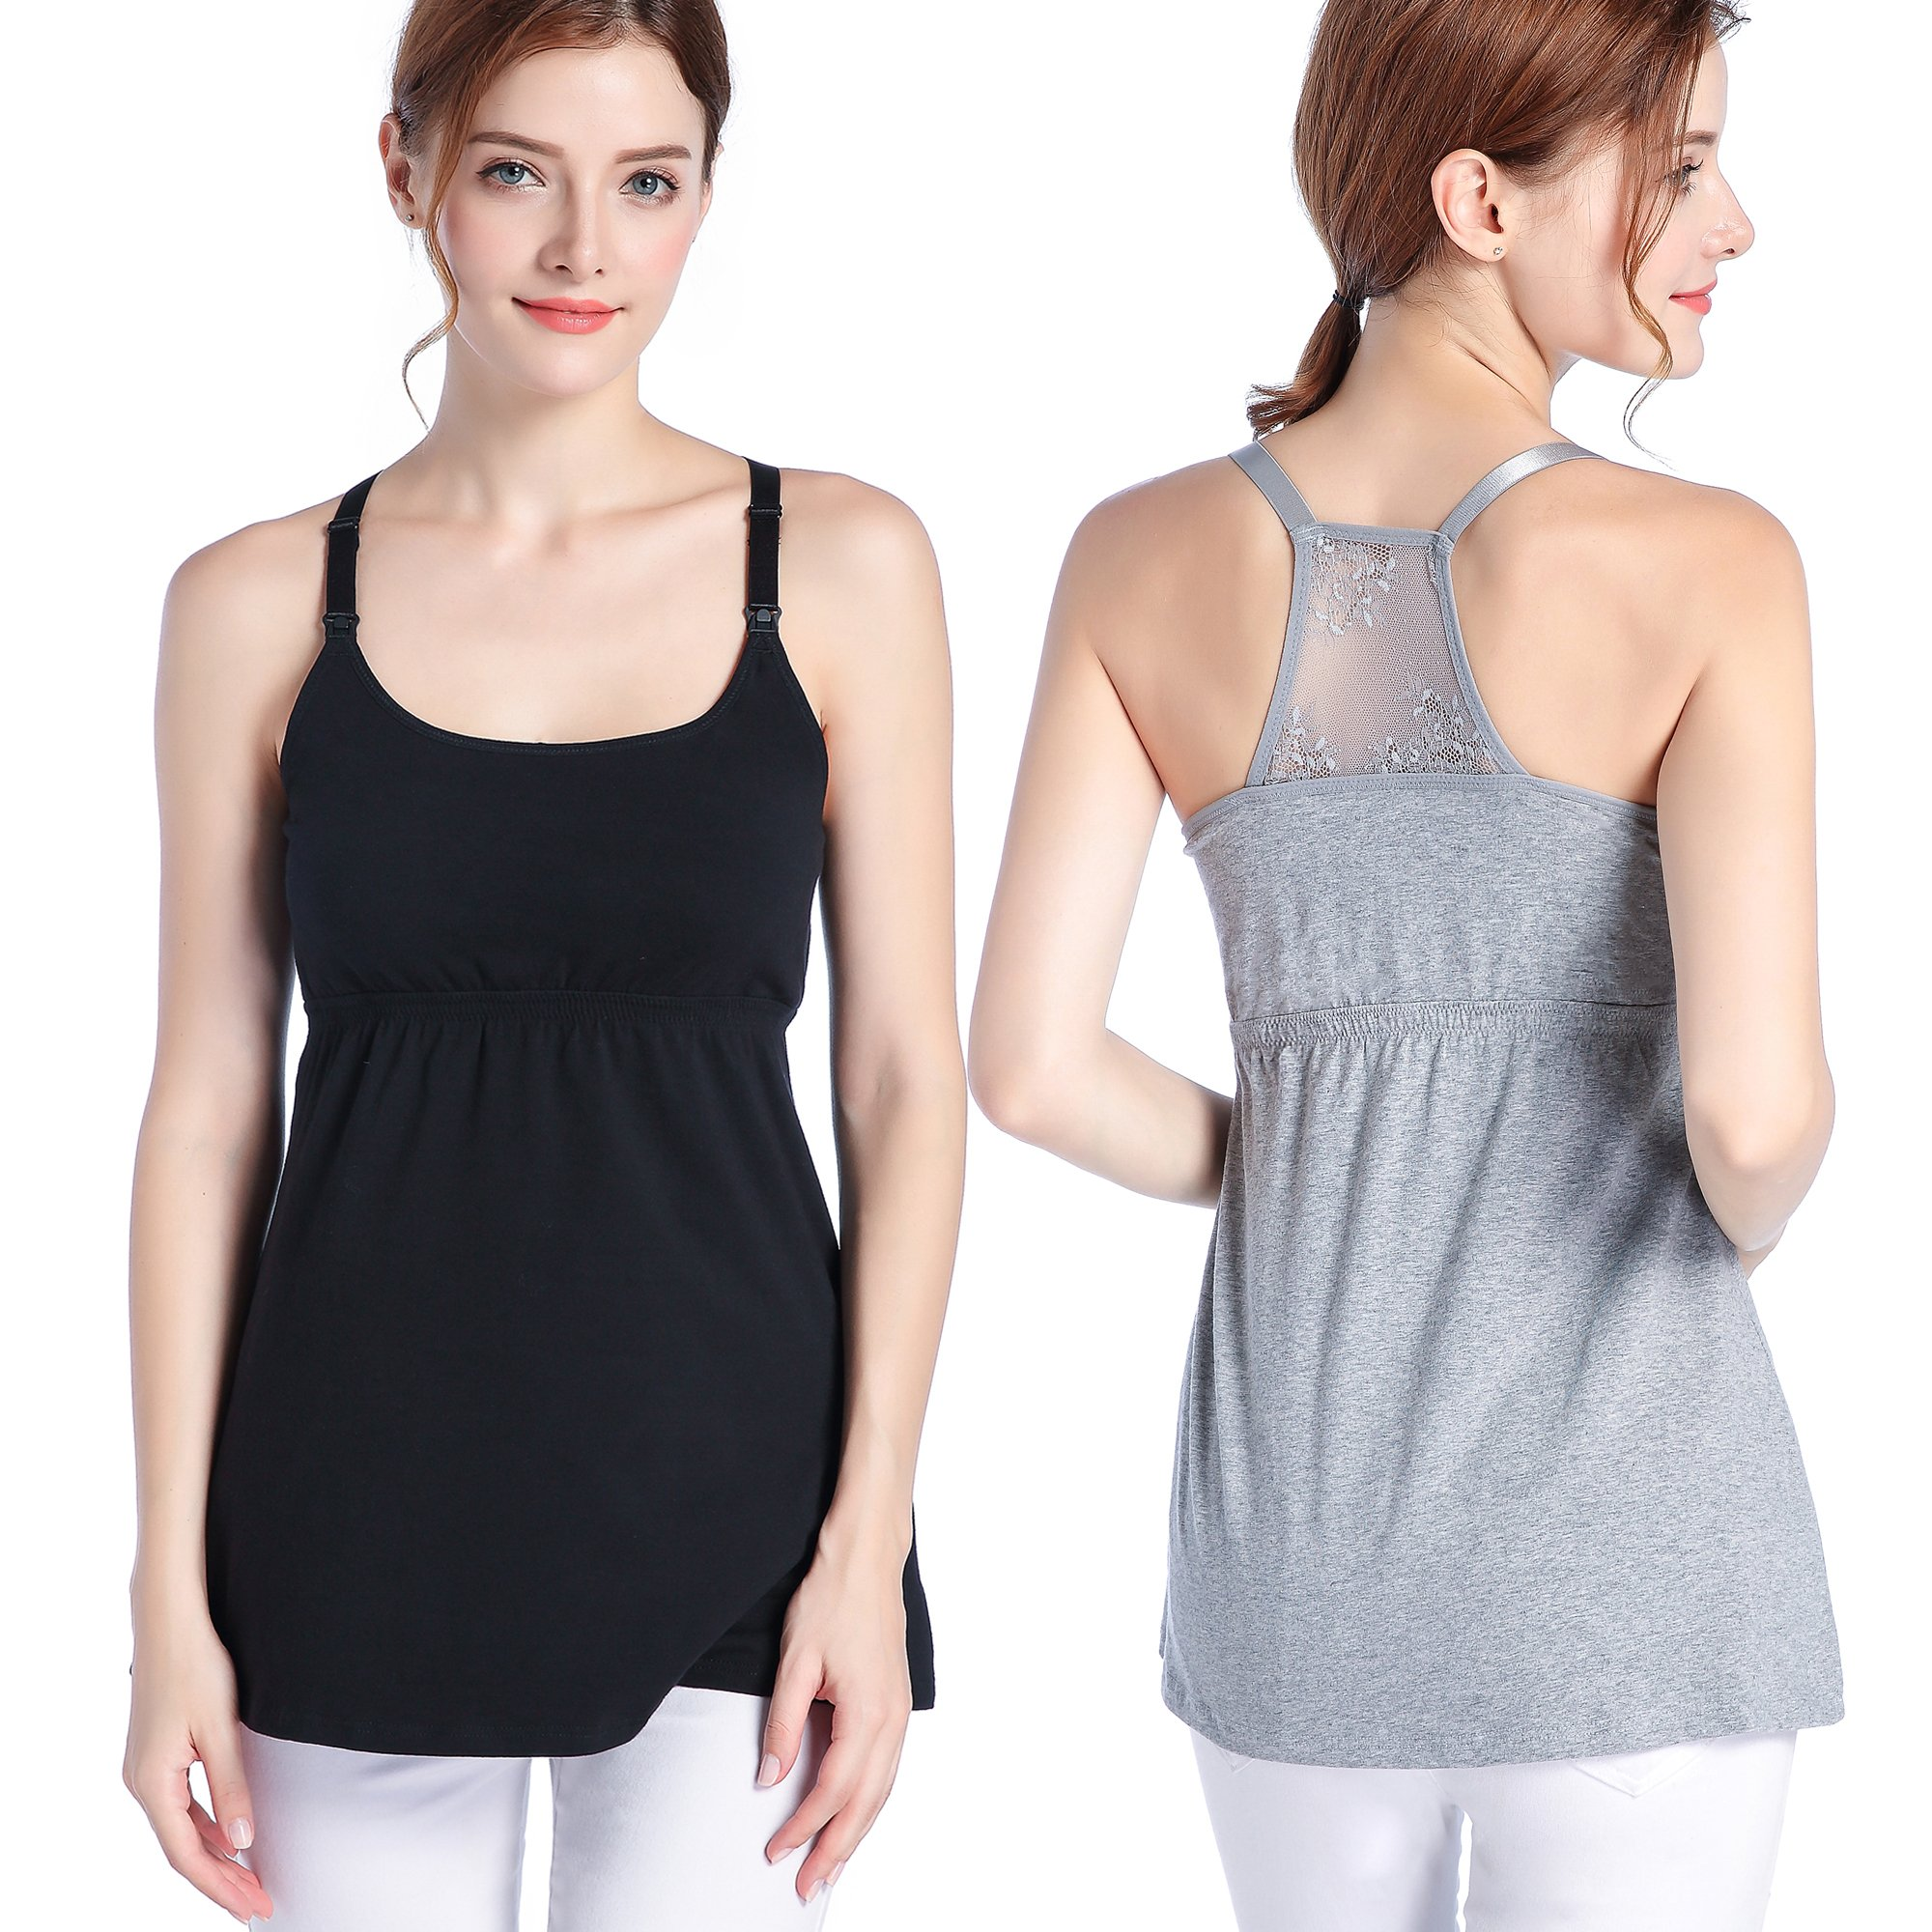 TANZKY 3PACK Nursing Tops Tank Cami Maternity Shirt Sleep Bra for Breastfeeding (Large, Black/Grey (2/Pack))